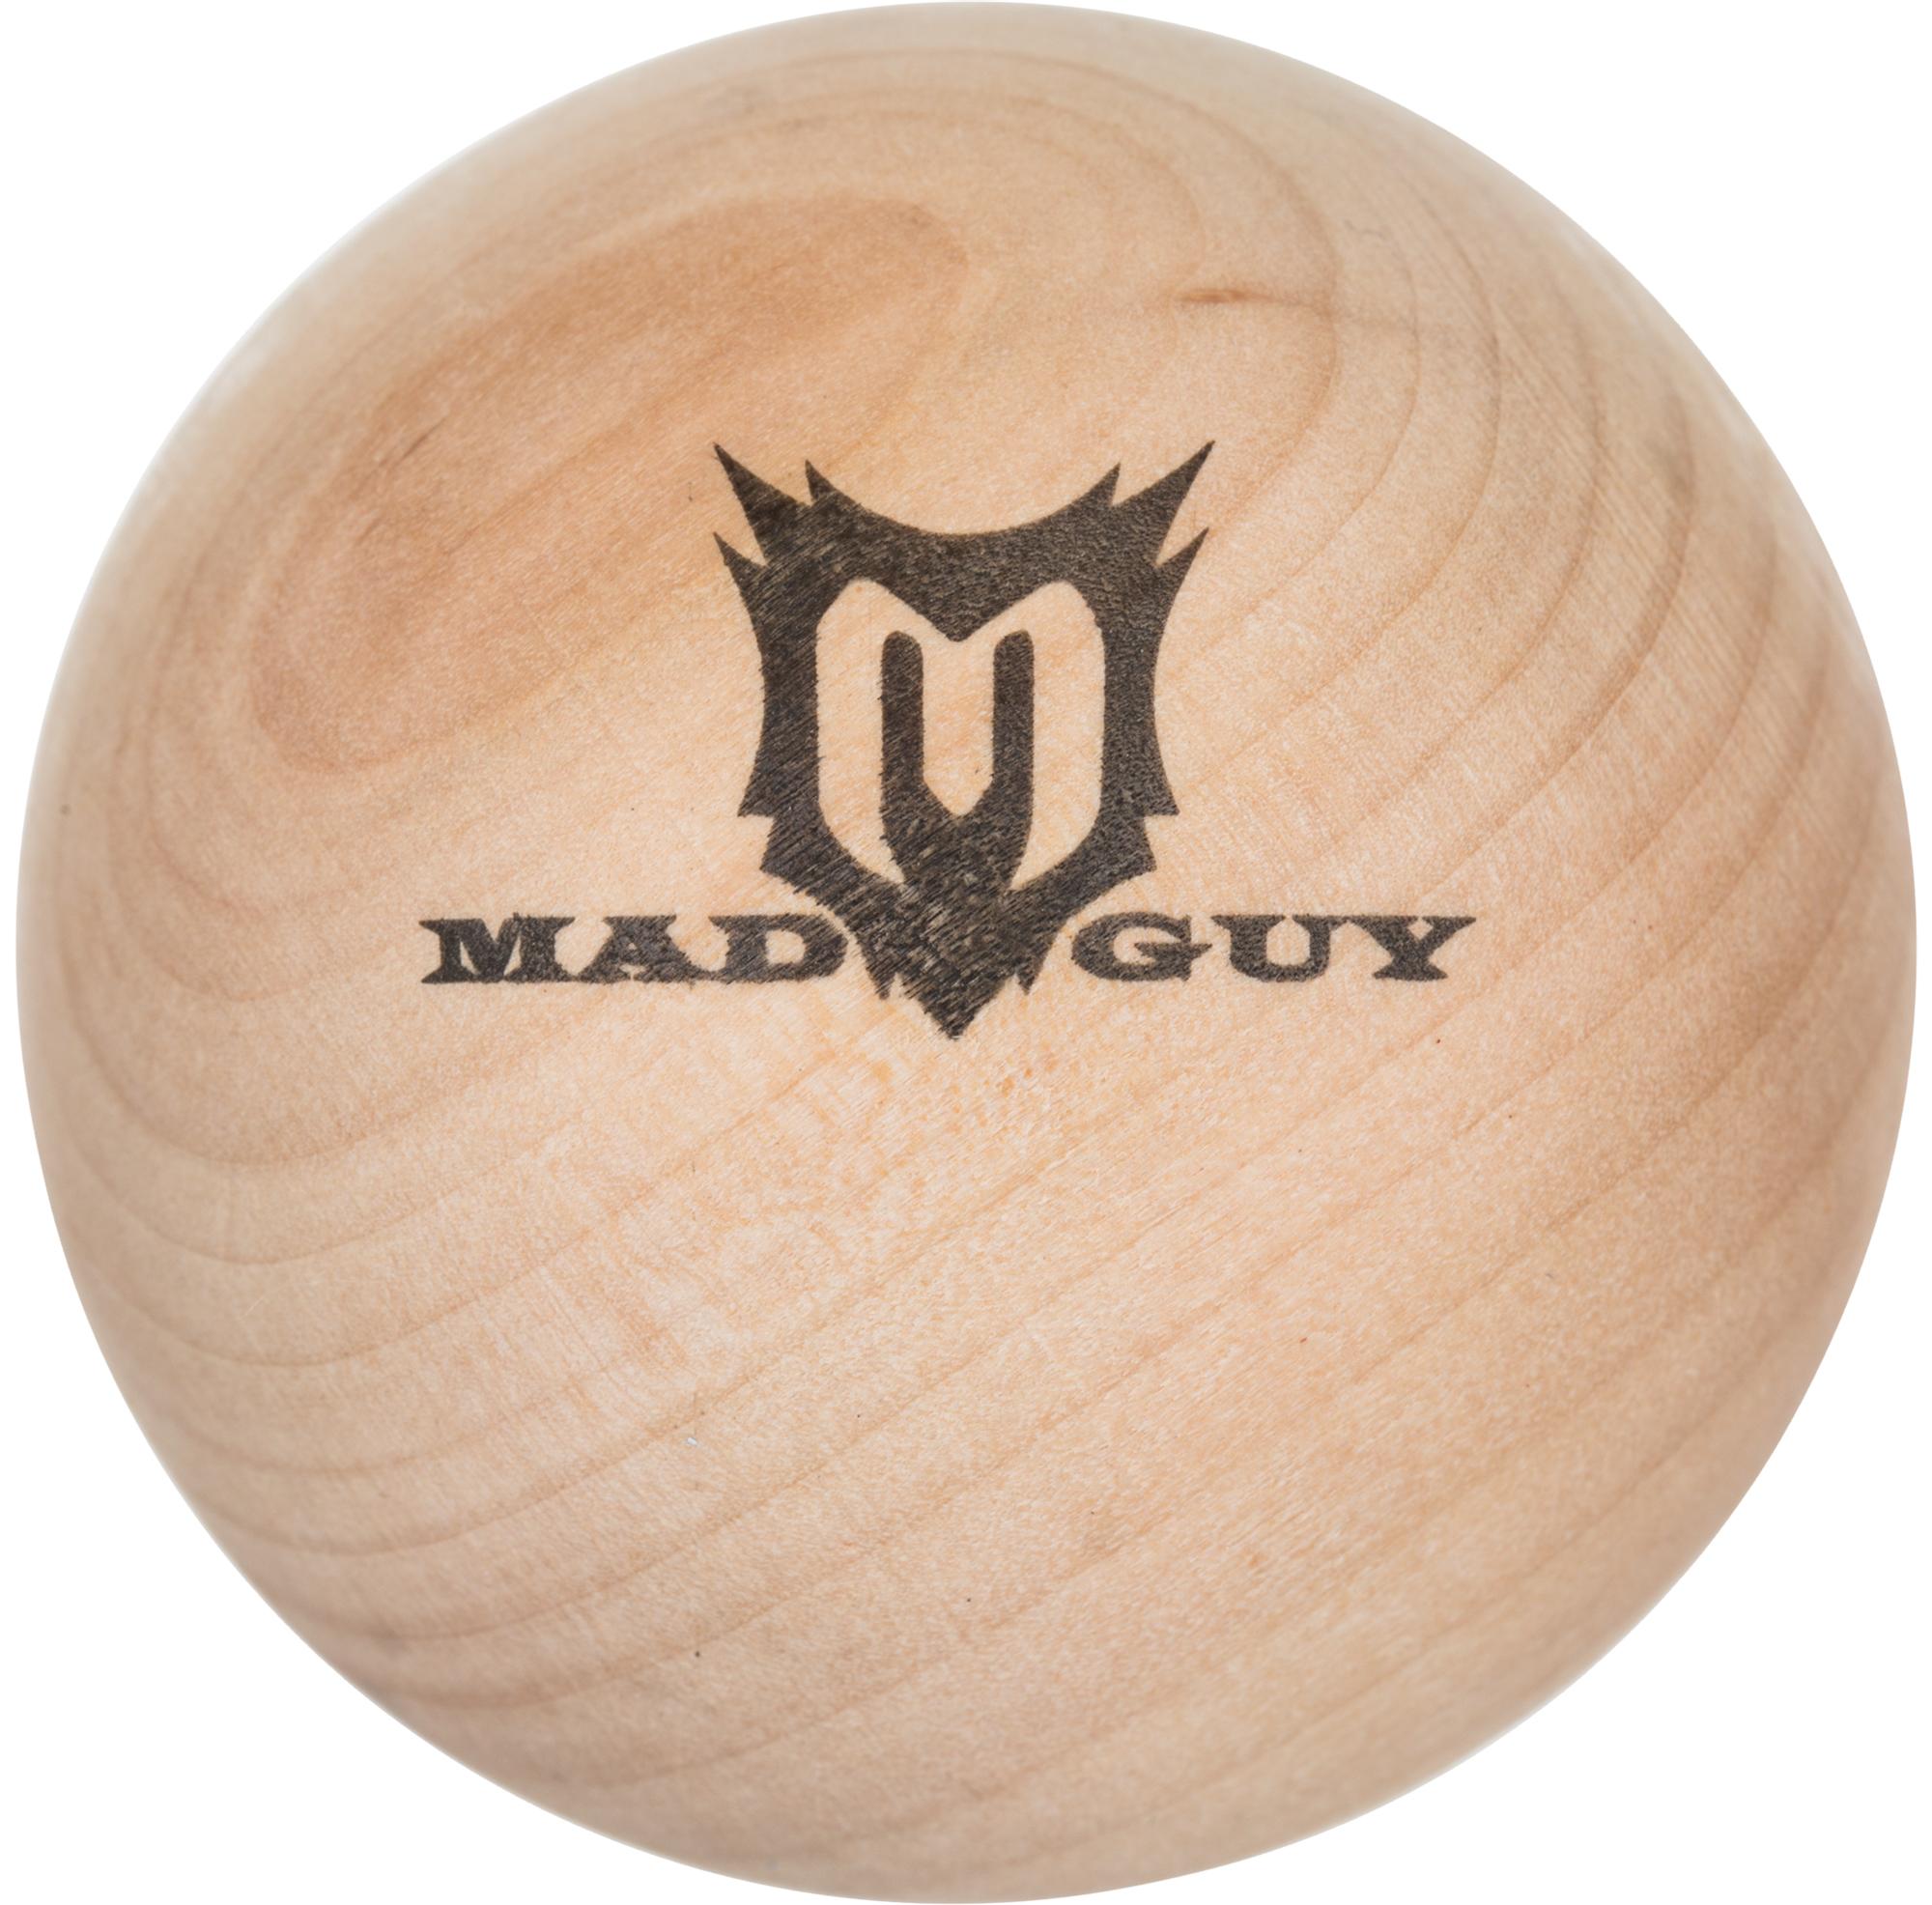 MadGuy Мяч хоккейный MAD GUY